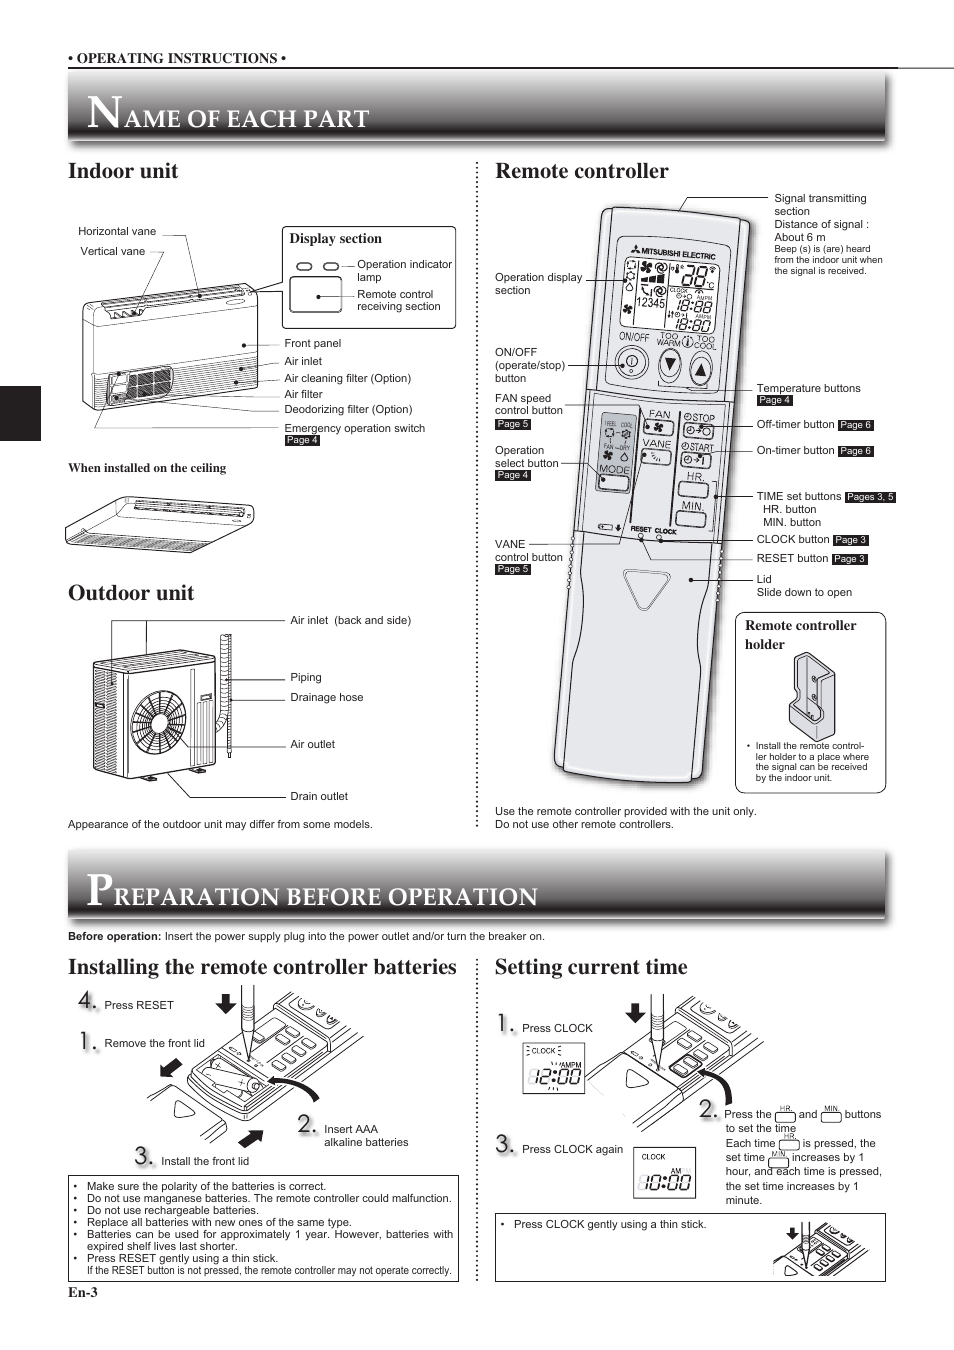 Mitsubishi Electric Air Conditioners Mr Slim Manual Manual Guide